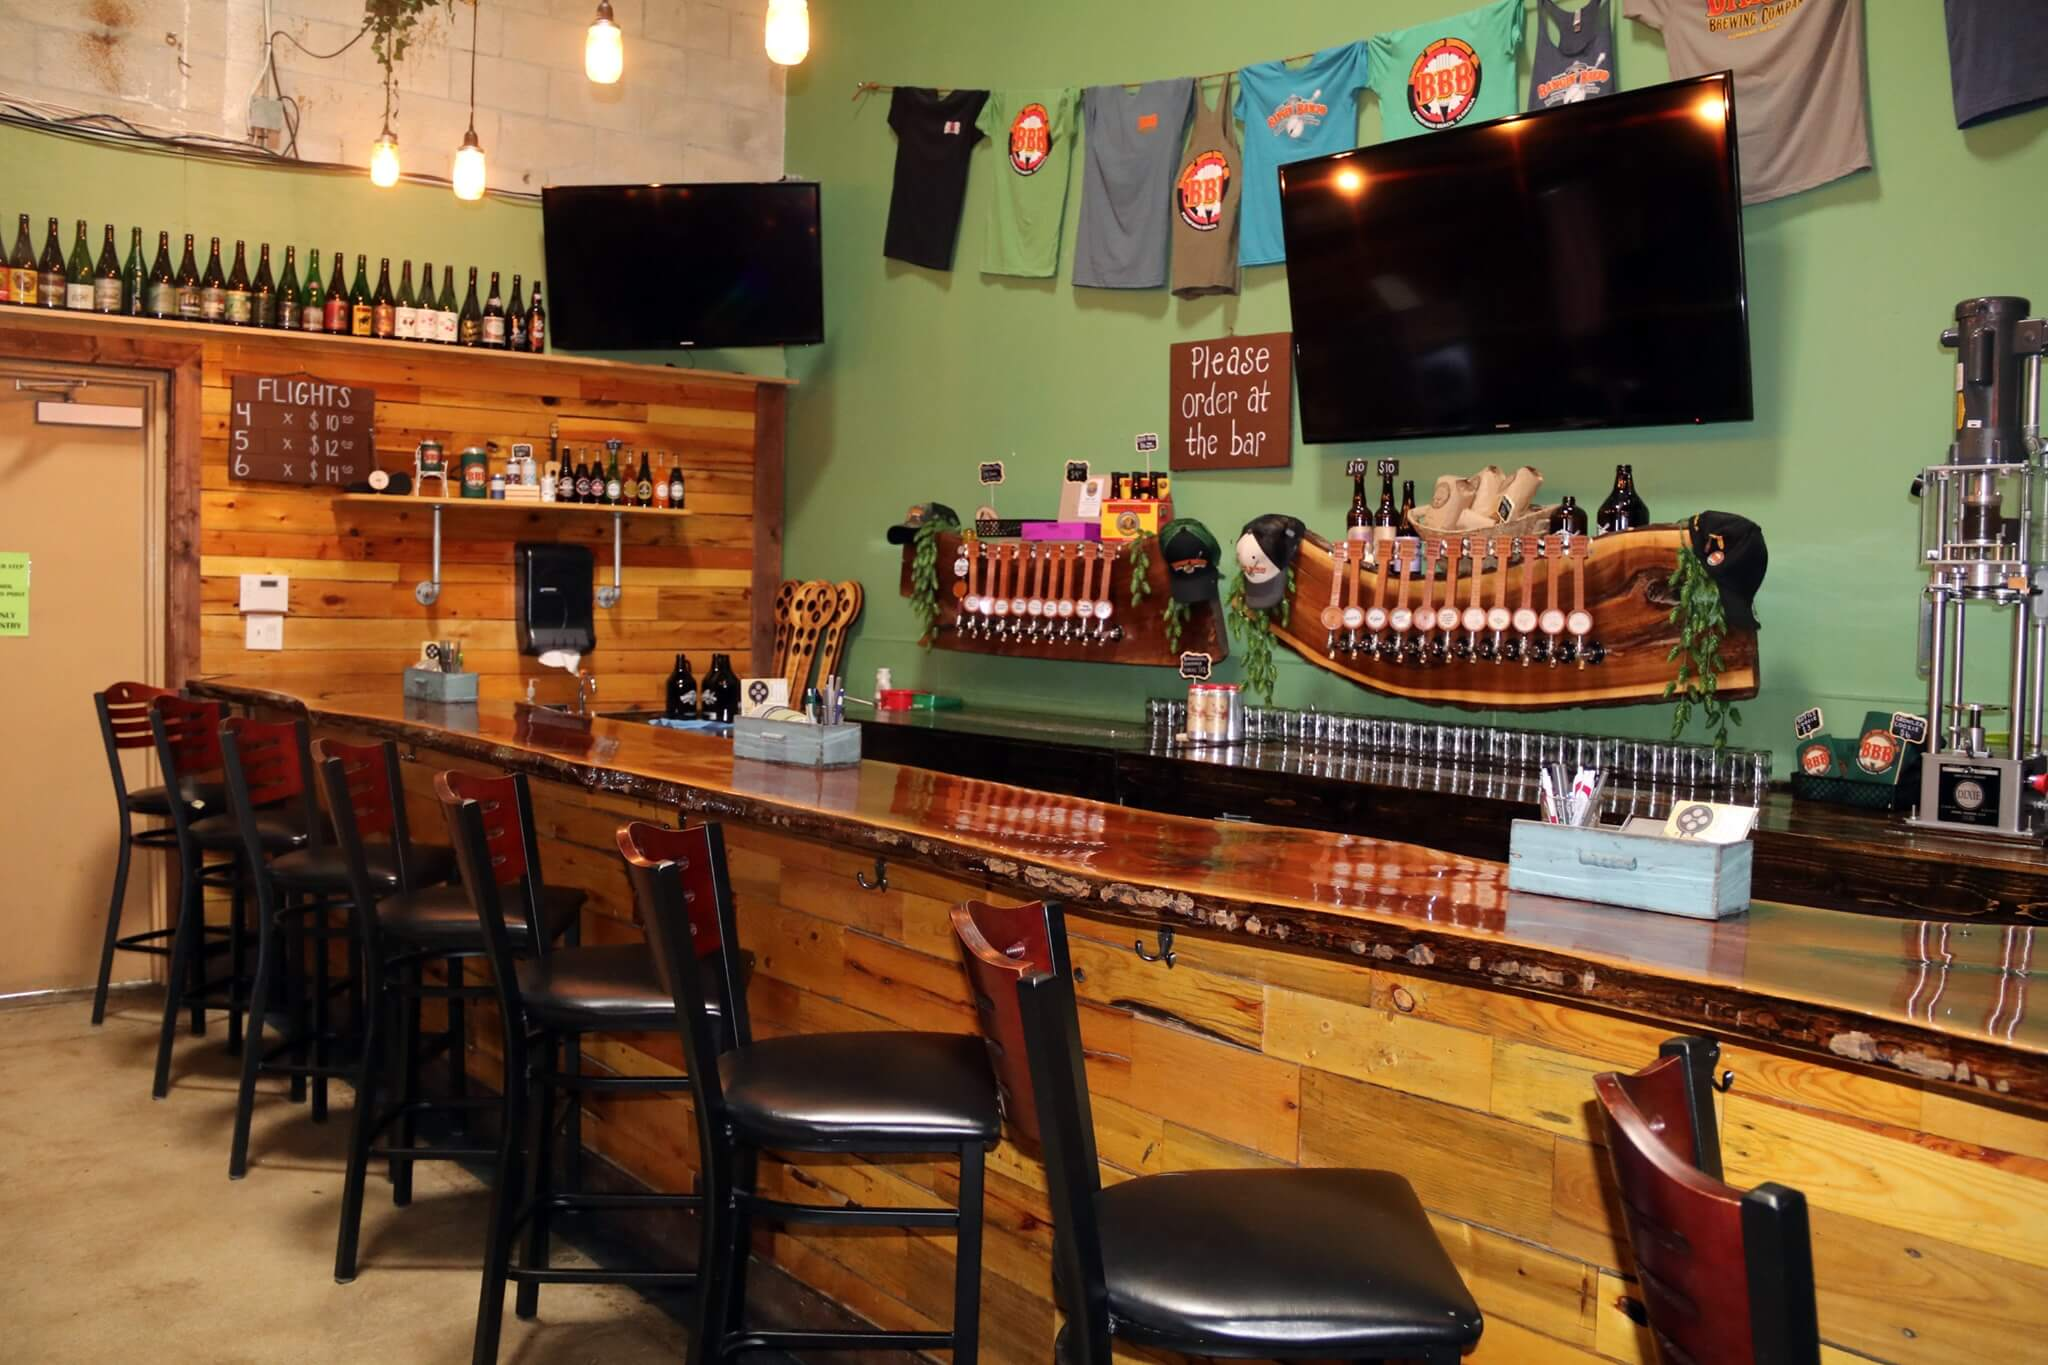 Inside the taproom at Bangin' Banjo Brewing Company in Pompano Beach, Florida